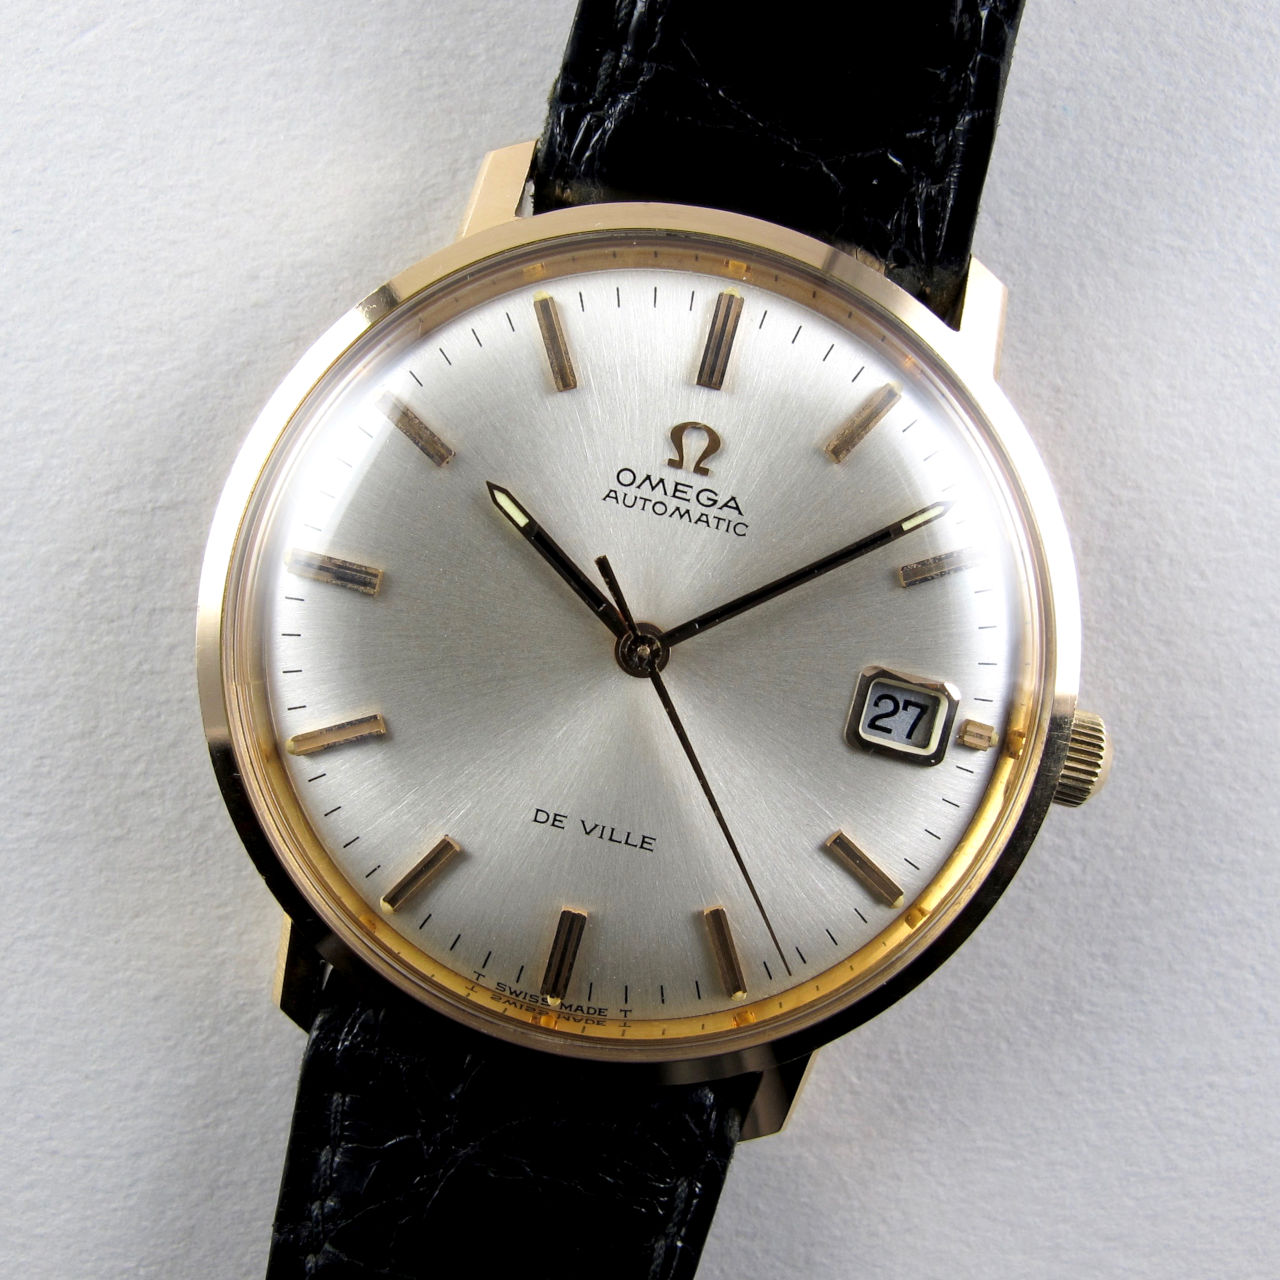 Omega De Ville Ref. 166.3033 18ct pink gold vintage wristwatch, circa 1968